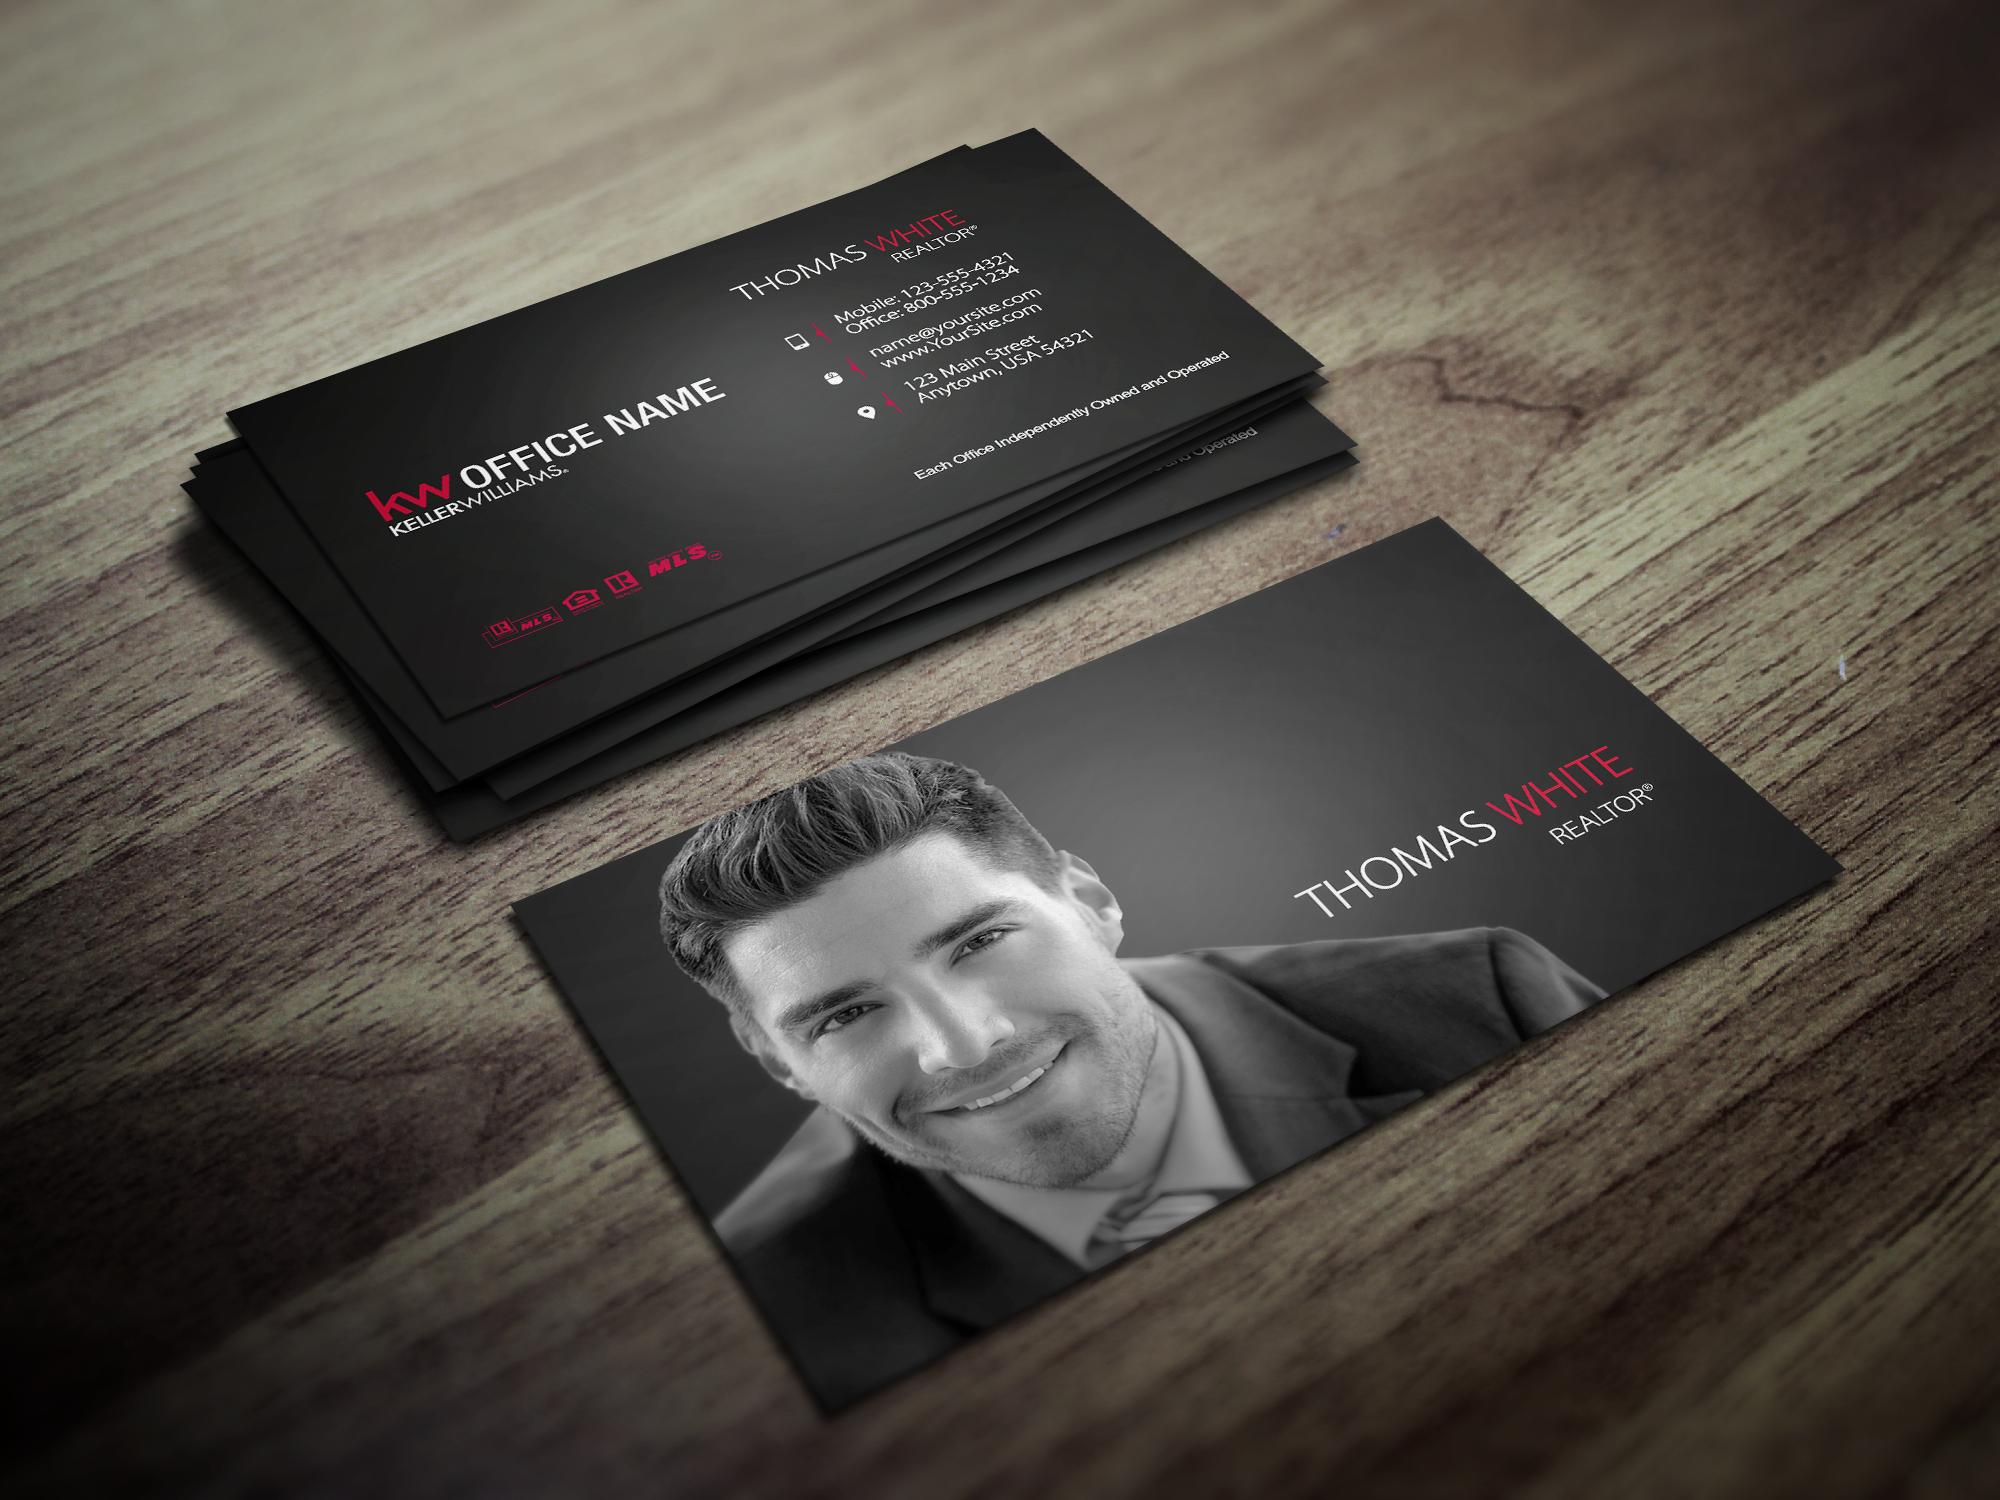 New Sleek Business Card Designs Are Here For Keller Williams Realtors Realtor Kellerwilliams Keller Williams Business Cards Business Card Design Card Design